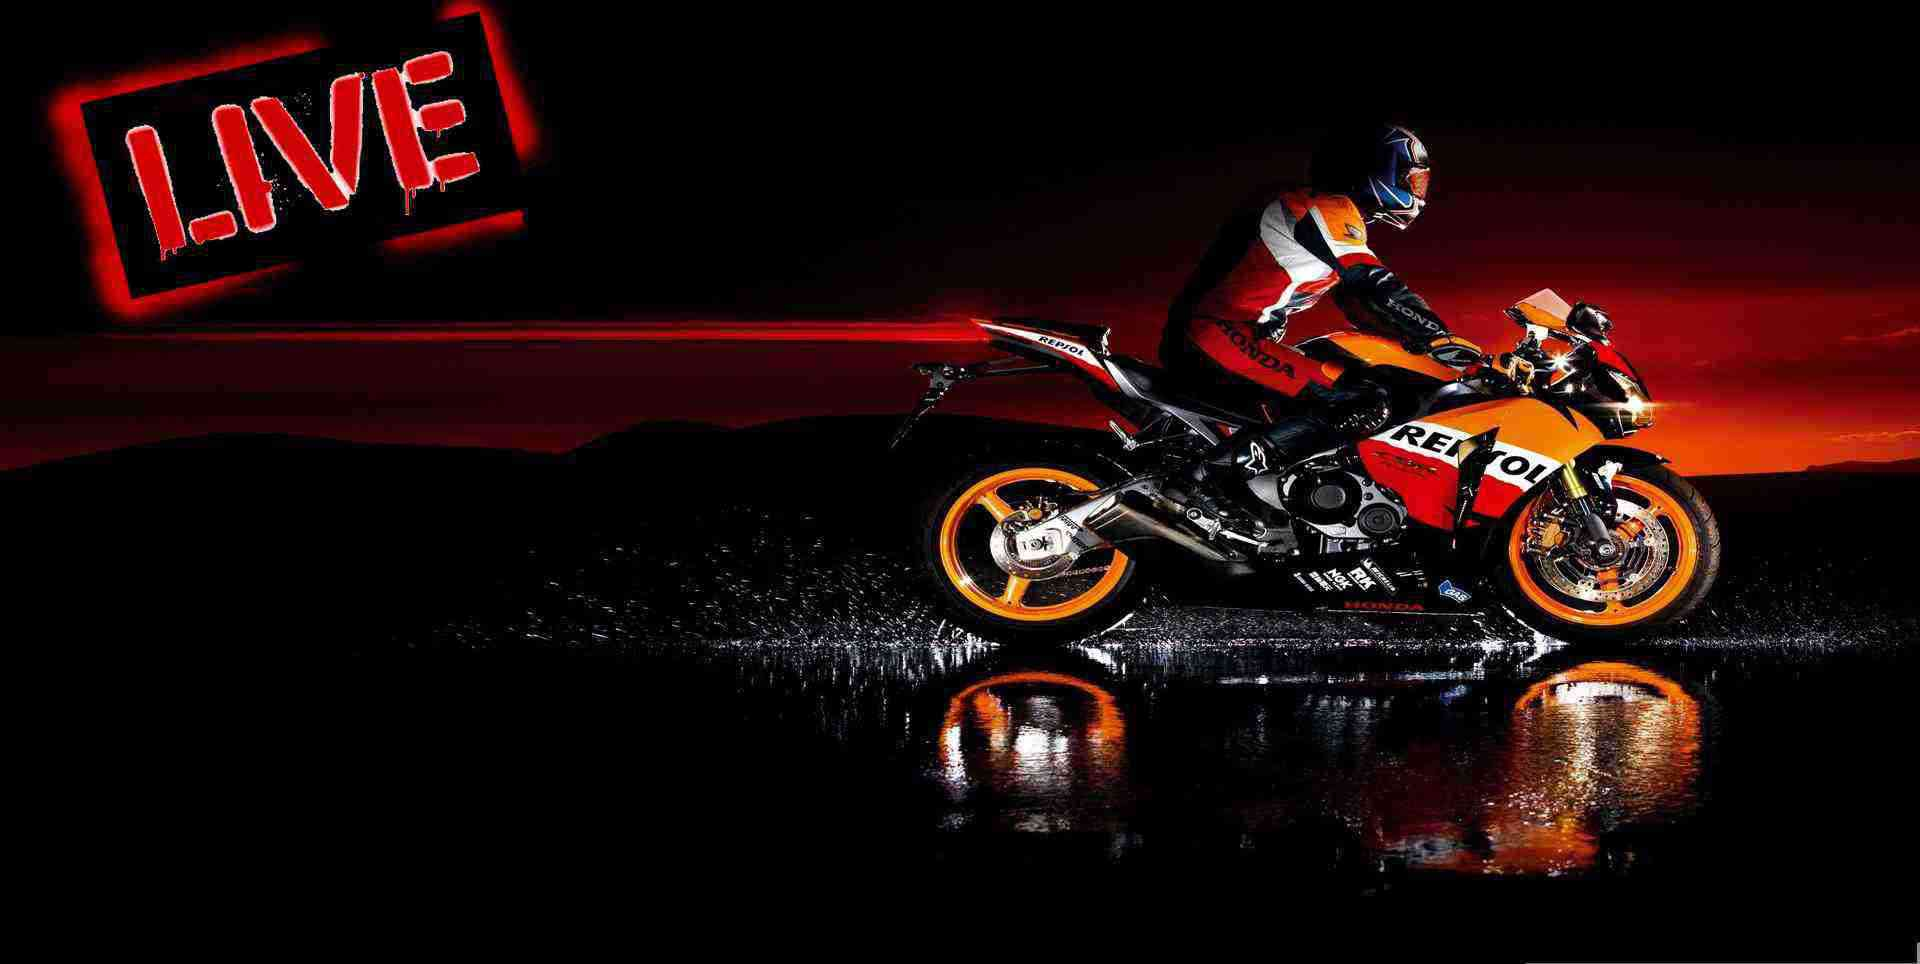 utah-motoamerica-superbike-championship-live